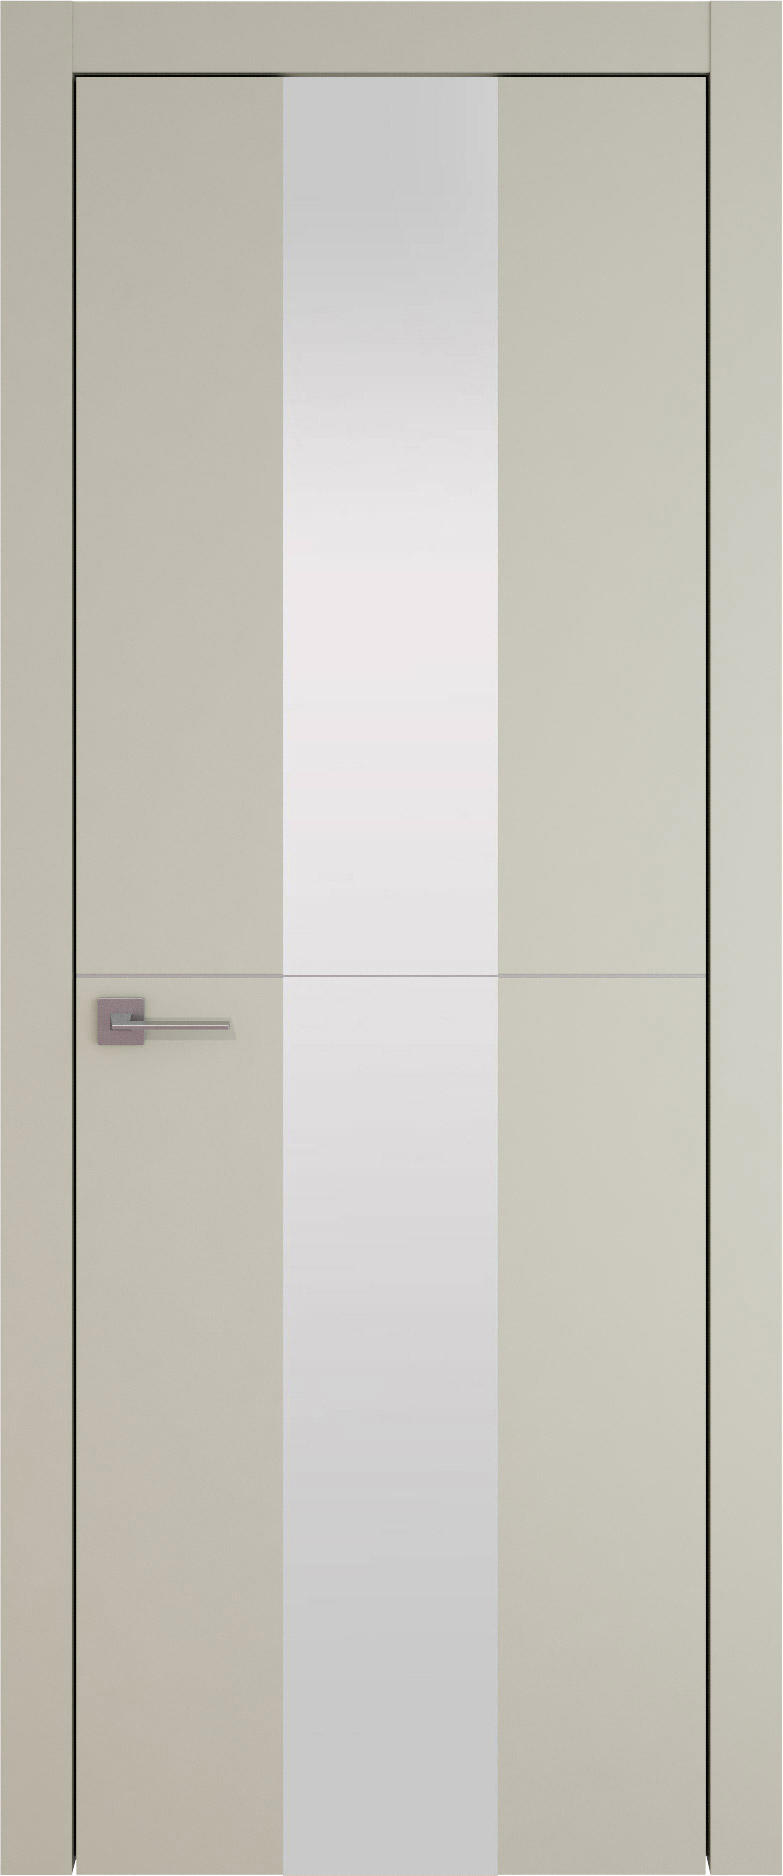 Tivoli Ж-3 цвет - Серо-оливковая эмаль (RAL 7032) Со стеклом (ДО)